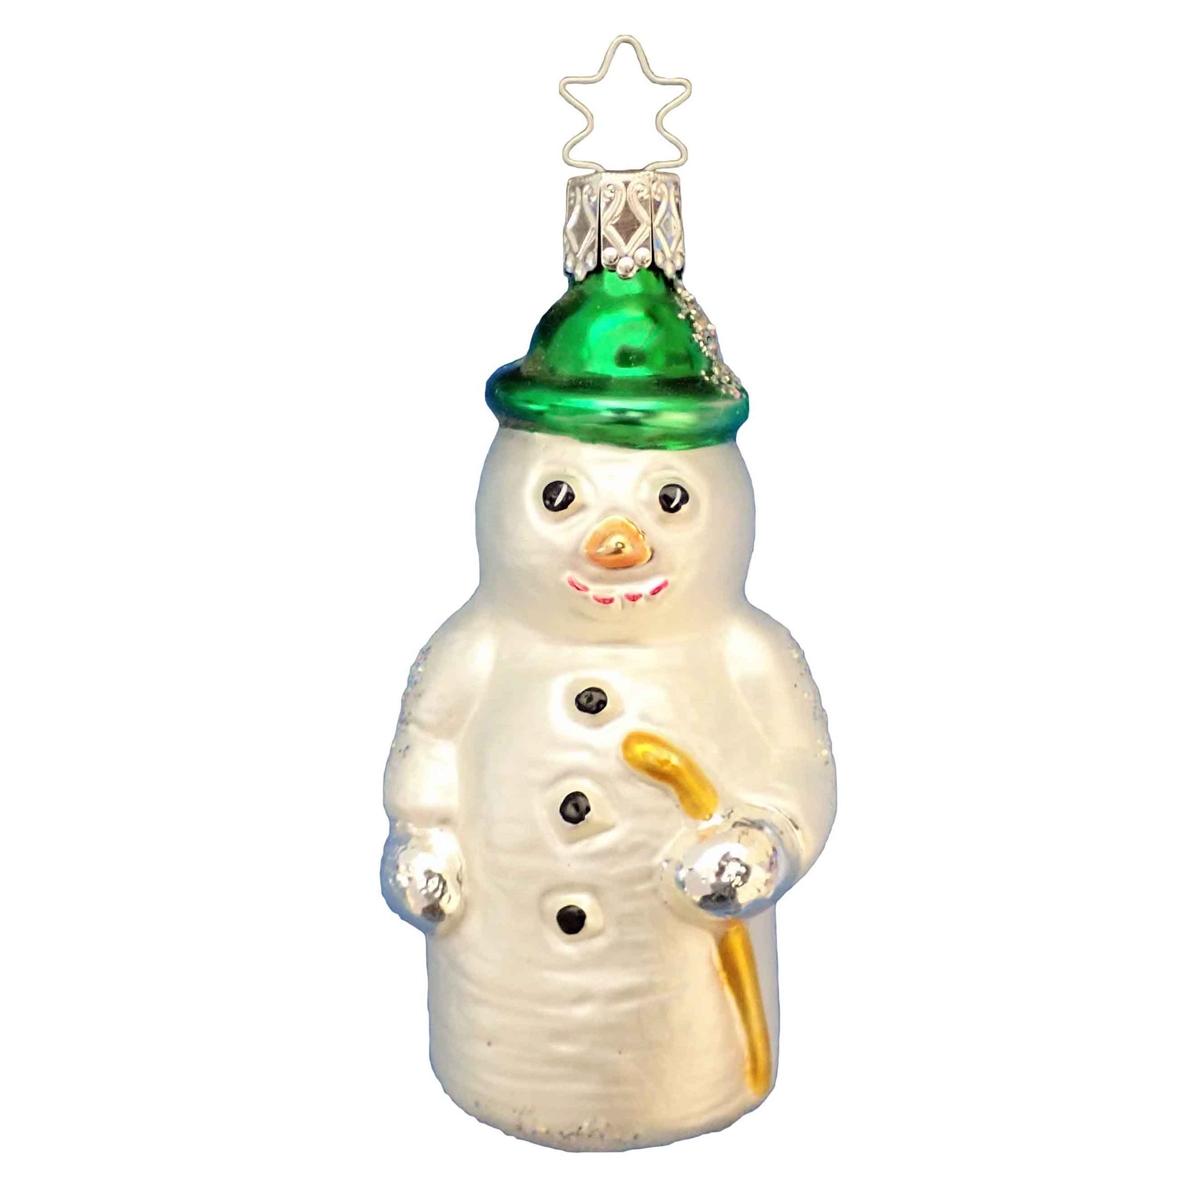 German Blown Glass Snowman Christmas Tree Ornament X Mas Decorations